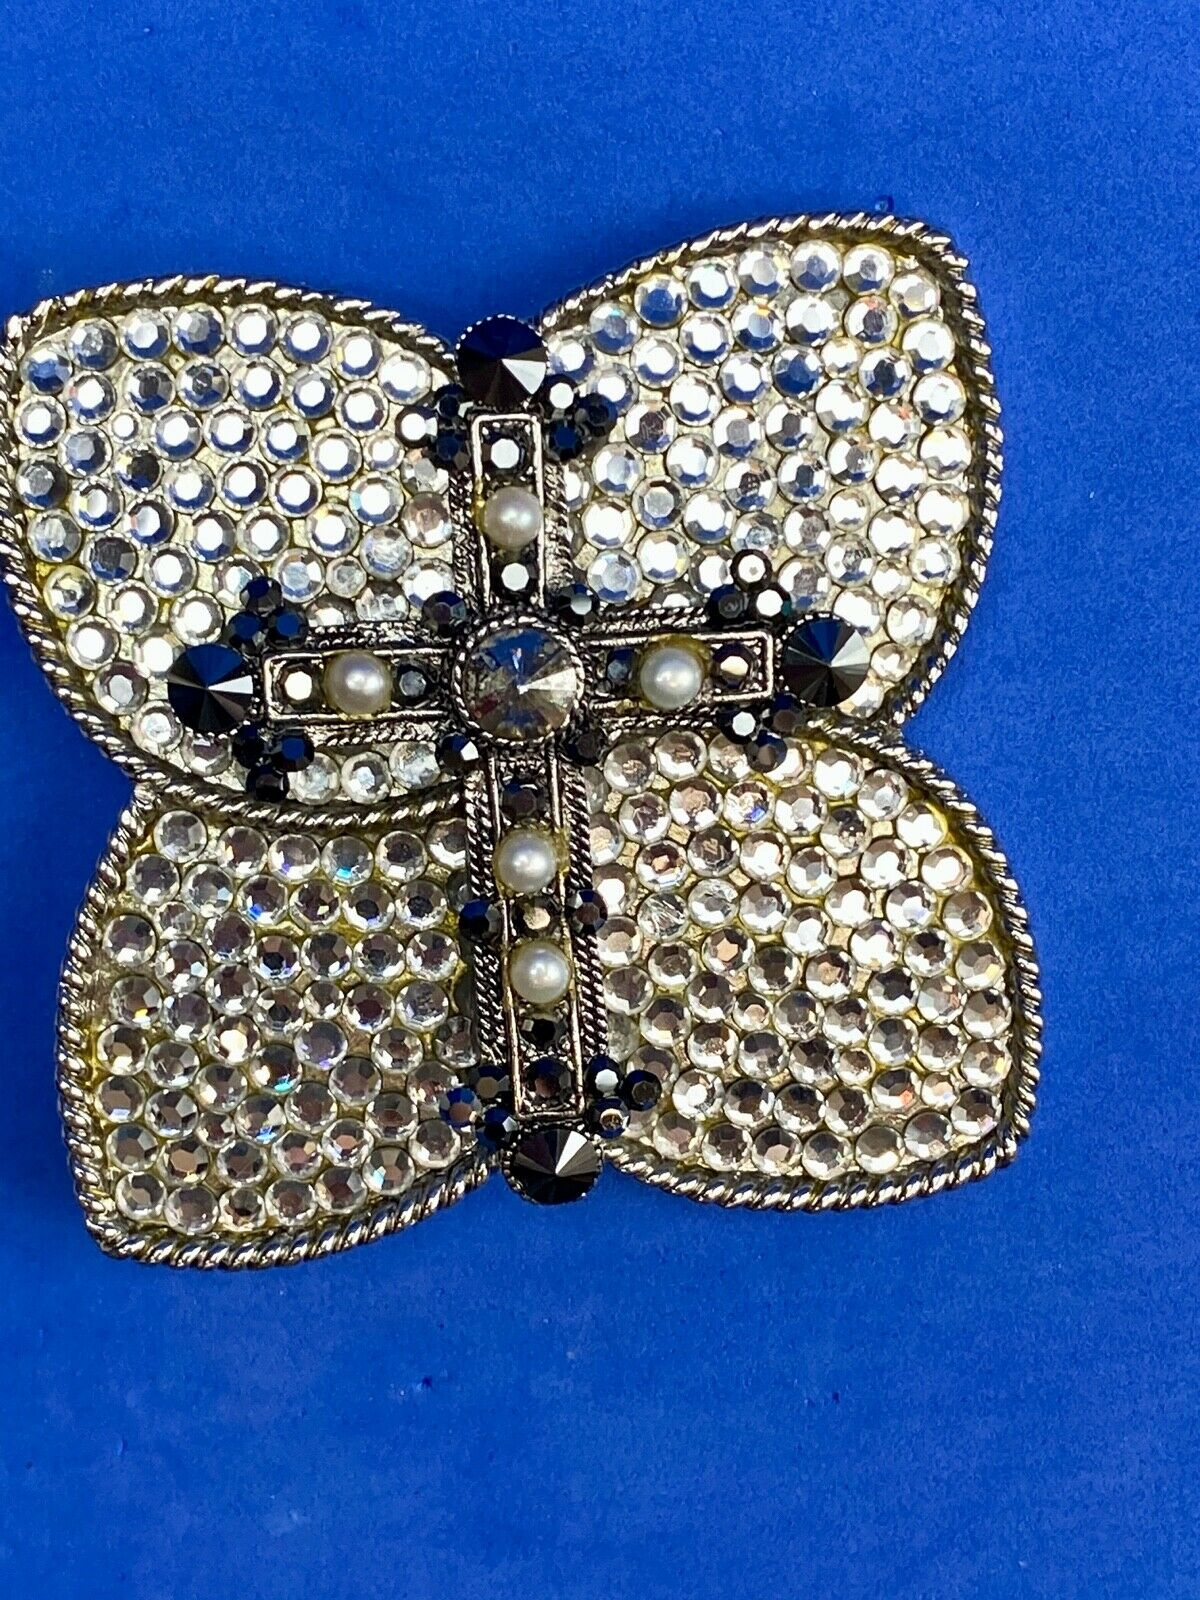 Cross on Butterfly Belt Buckle Silver Tone Braided Edges Pearl?